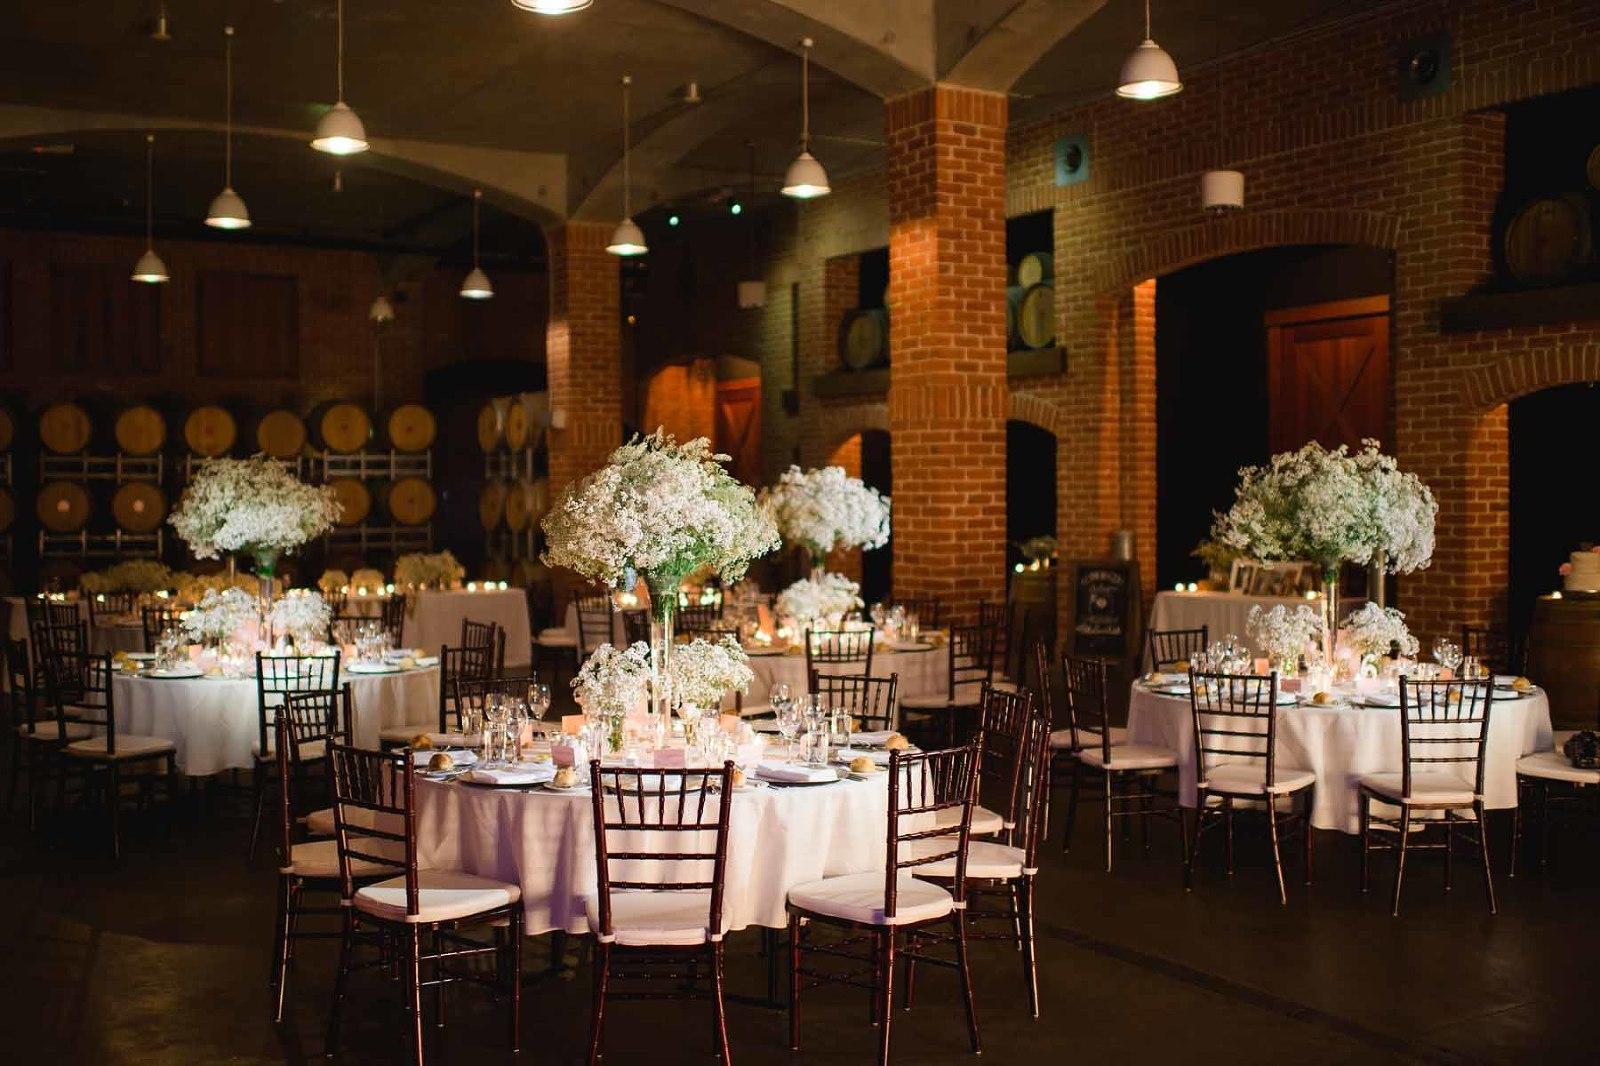 Brisbane wedding reception venue Sirromet winery - tables